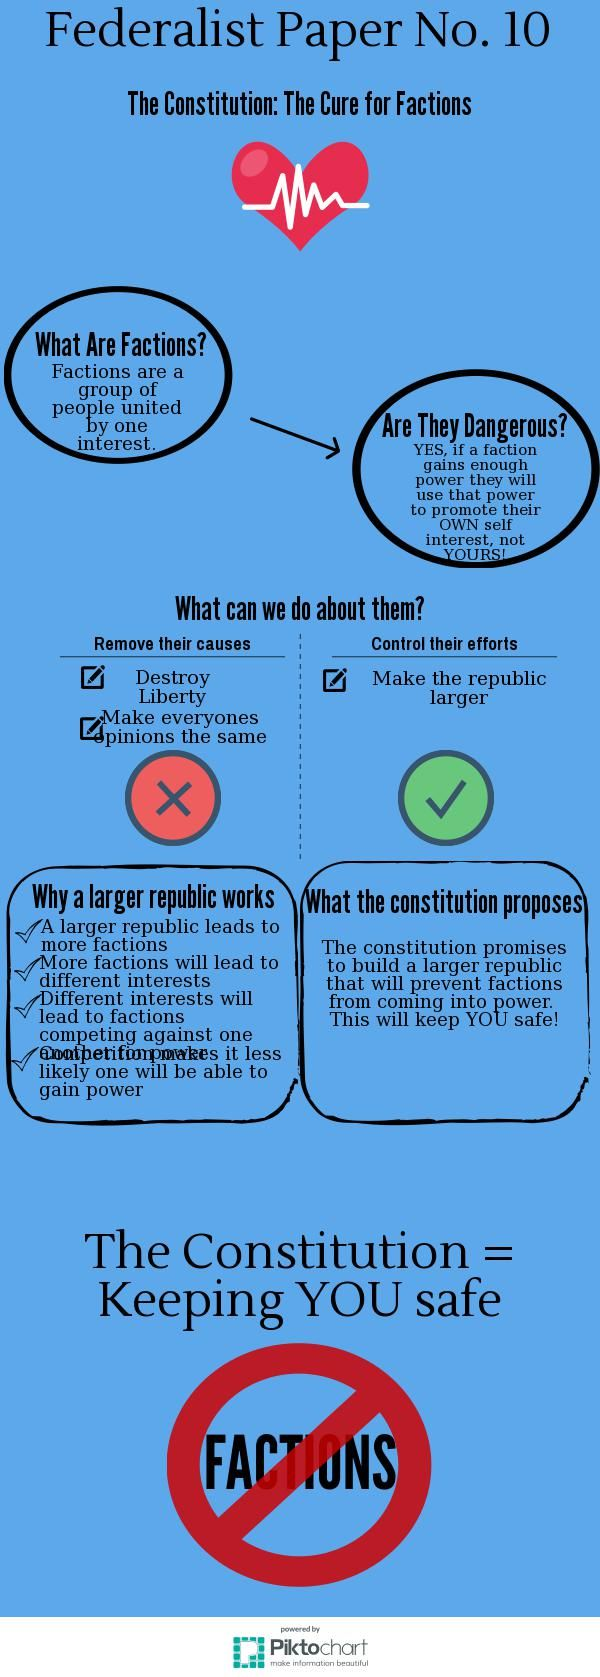 Federalist paper no. 10 | @Piktochart Infographic